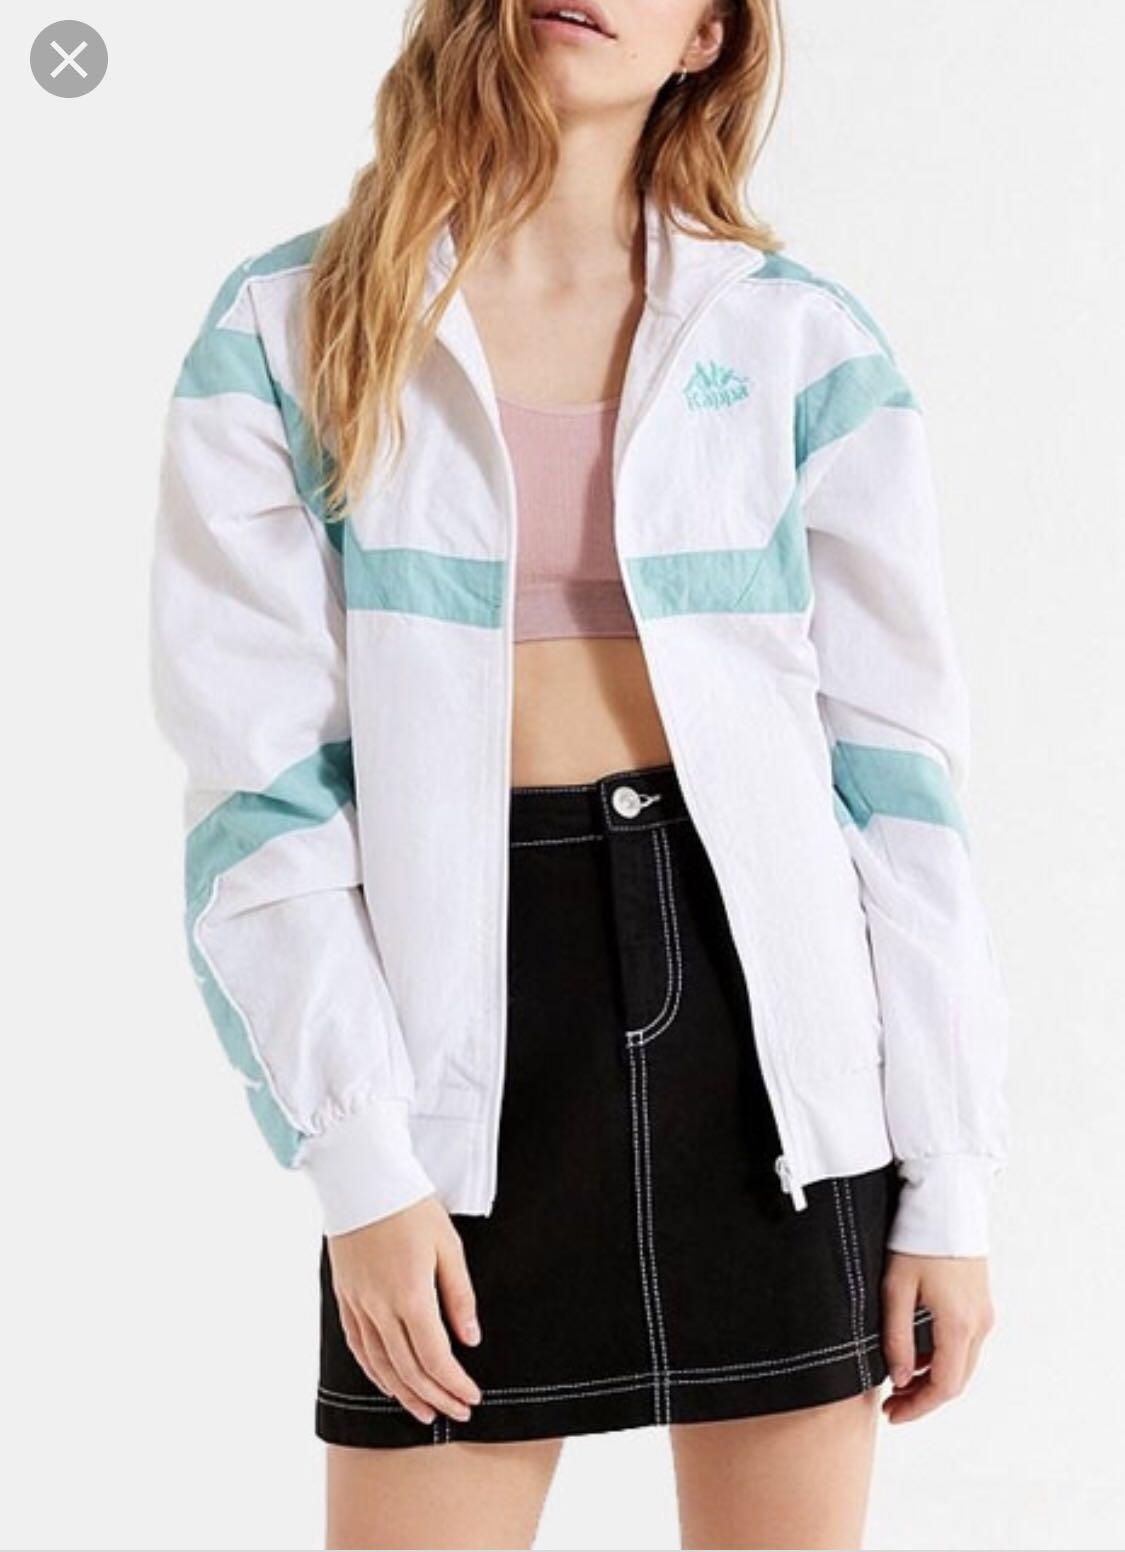 4b8db24122e Kappa x UO Jessy Track Jacket, Women's Fashion, Clothes, Outerwear ...